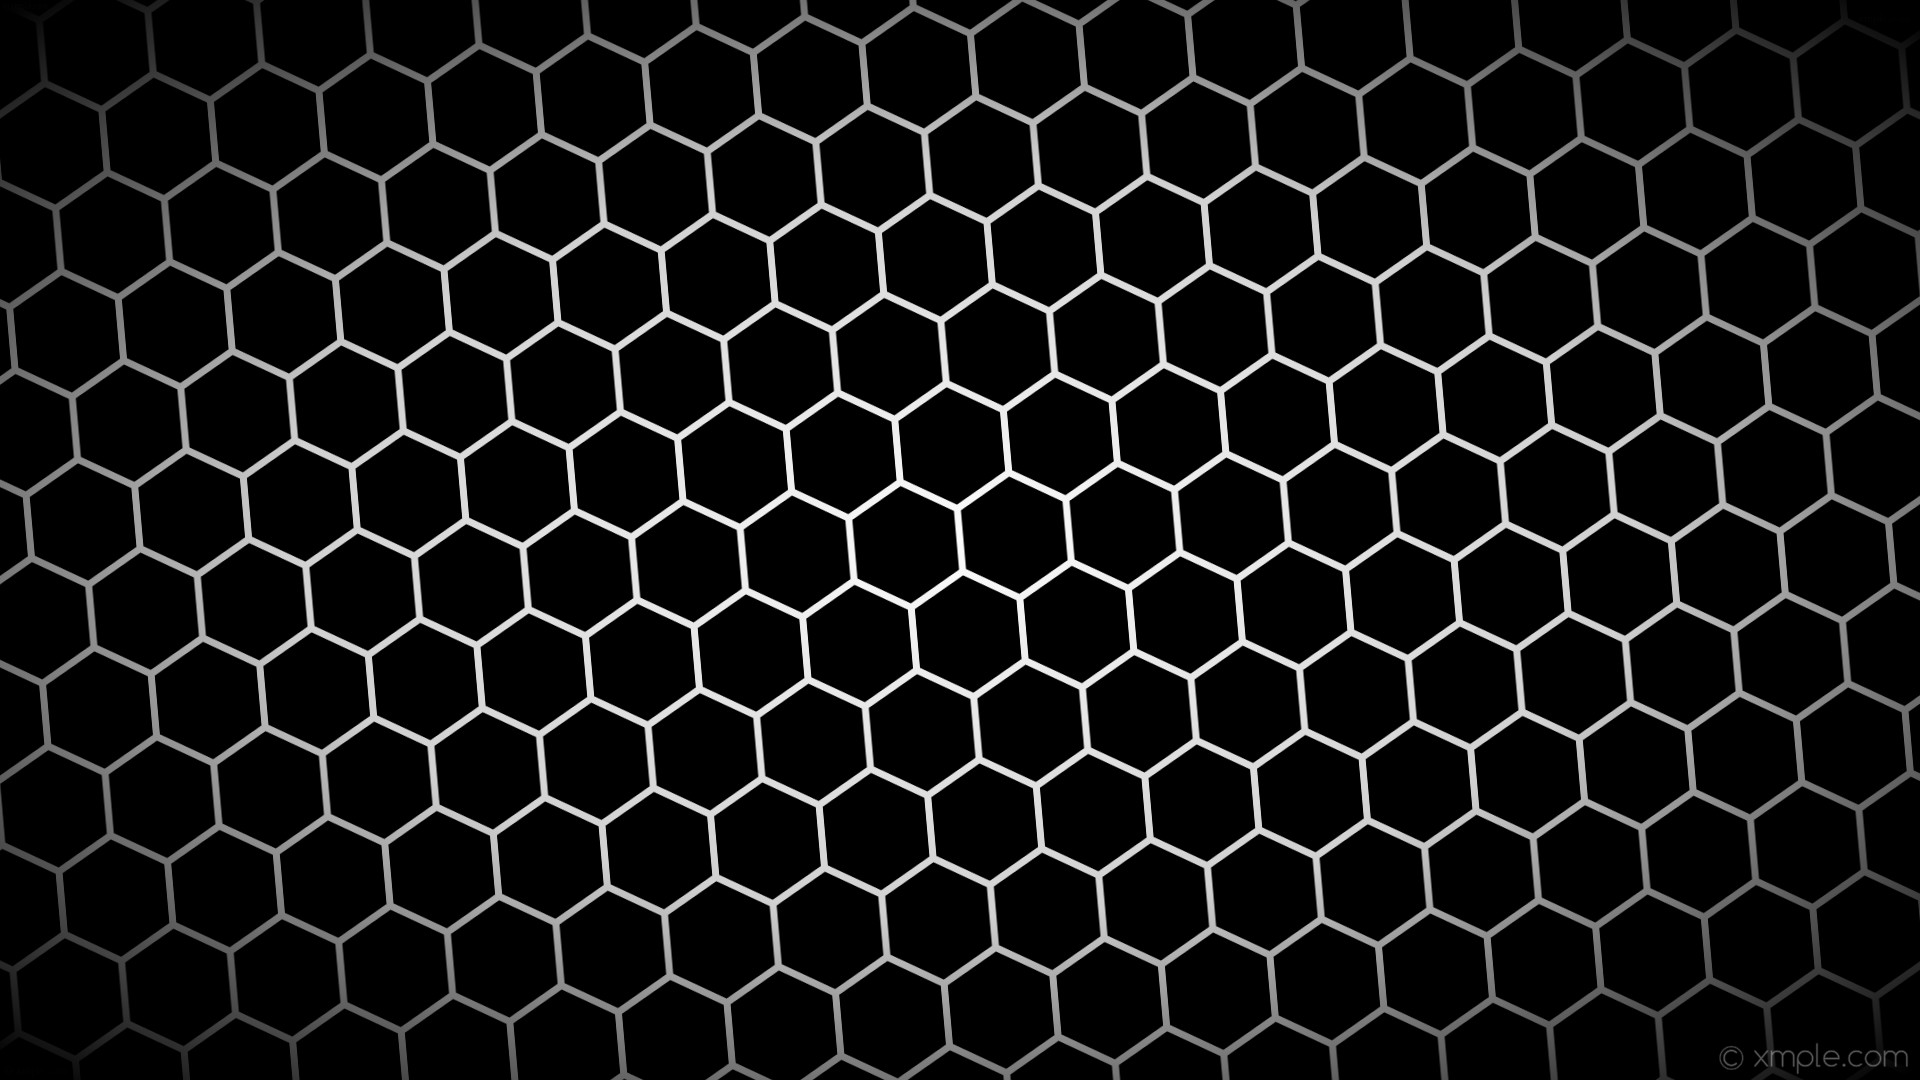 wallpaper black hexagon white gradient glow grey light gray #000000 #ffffff  #d3d3d3 diagonal